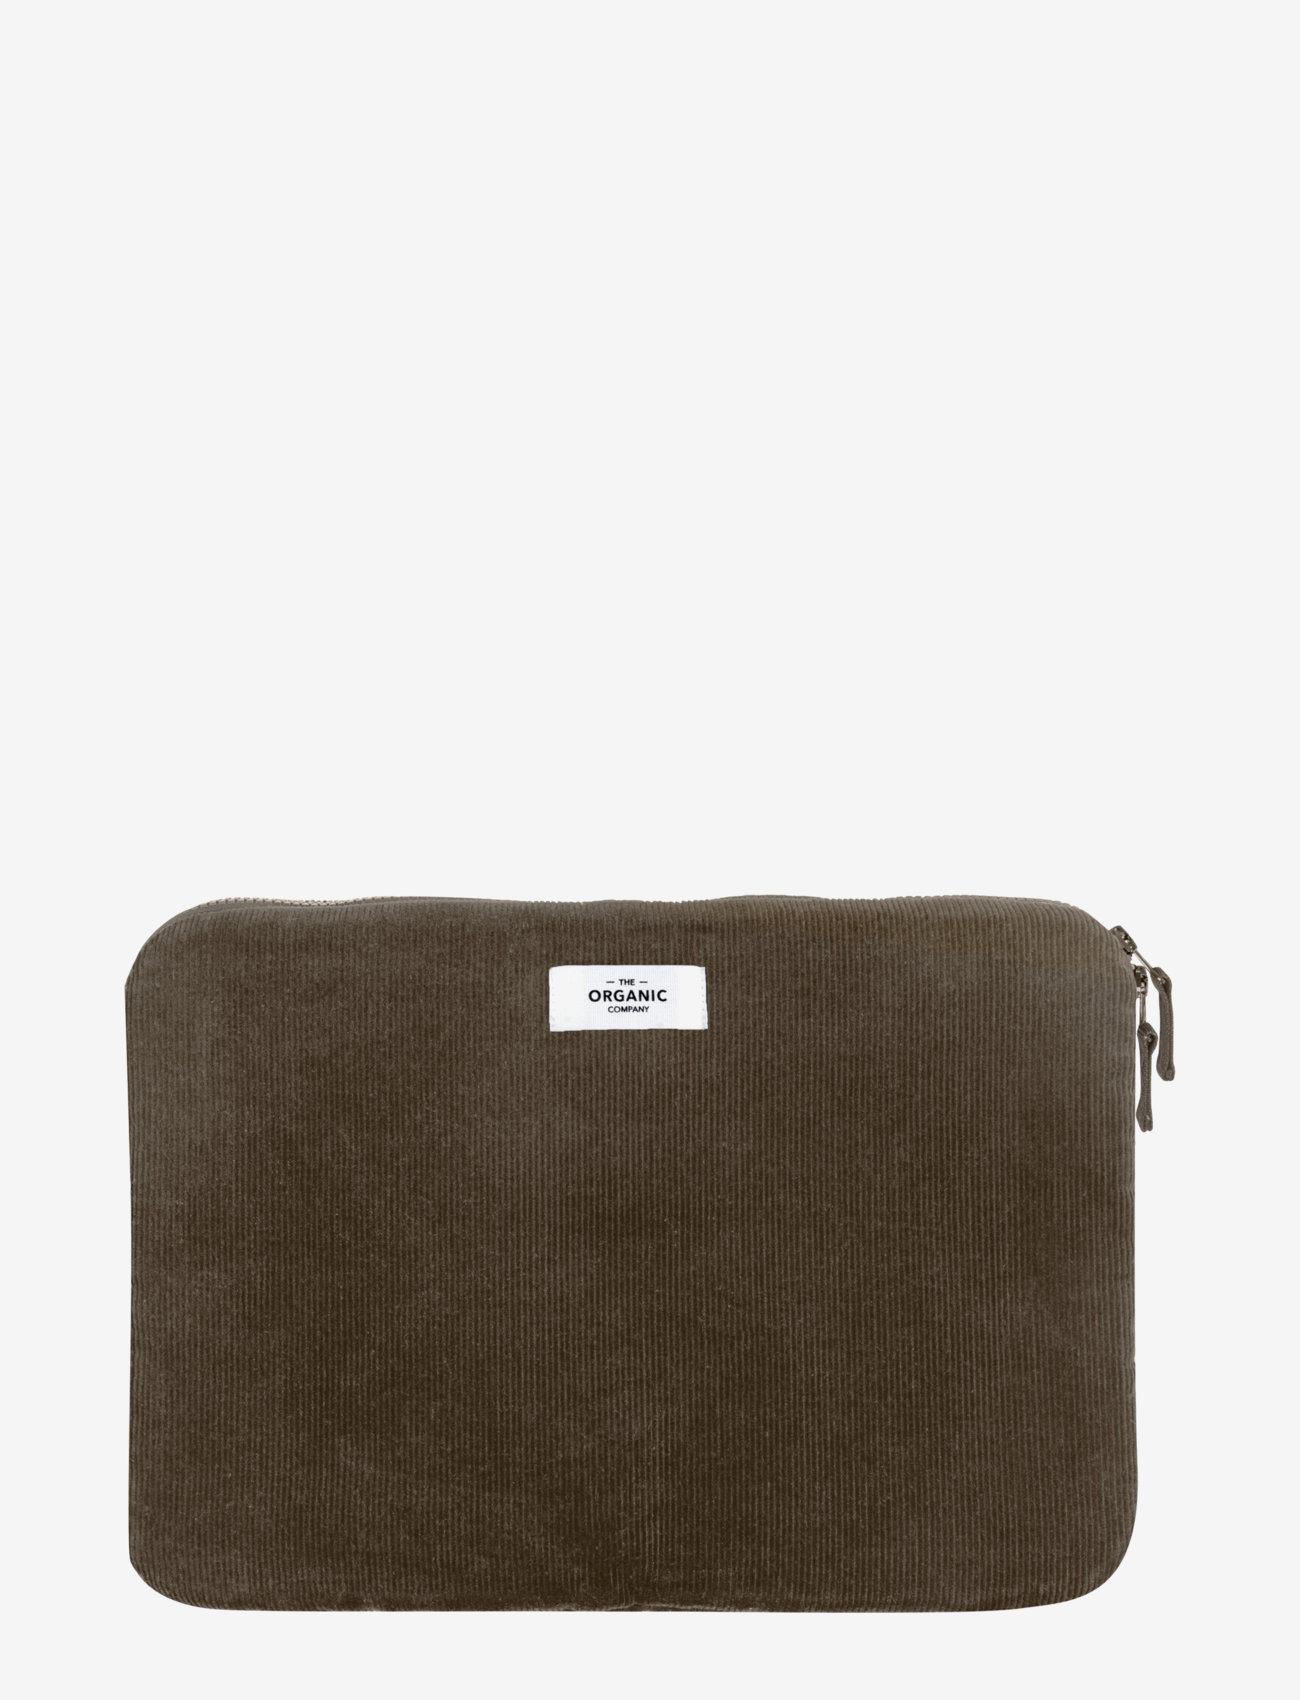 "The Organic Company - Laptop Sleeve 11"" - tassen - 225 clay - 1"